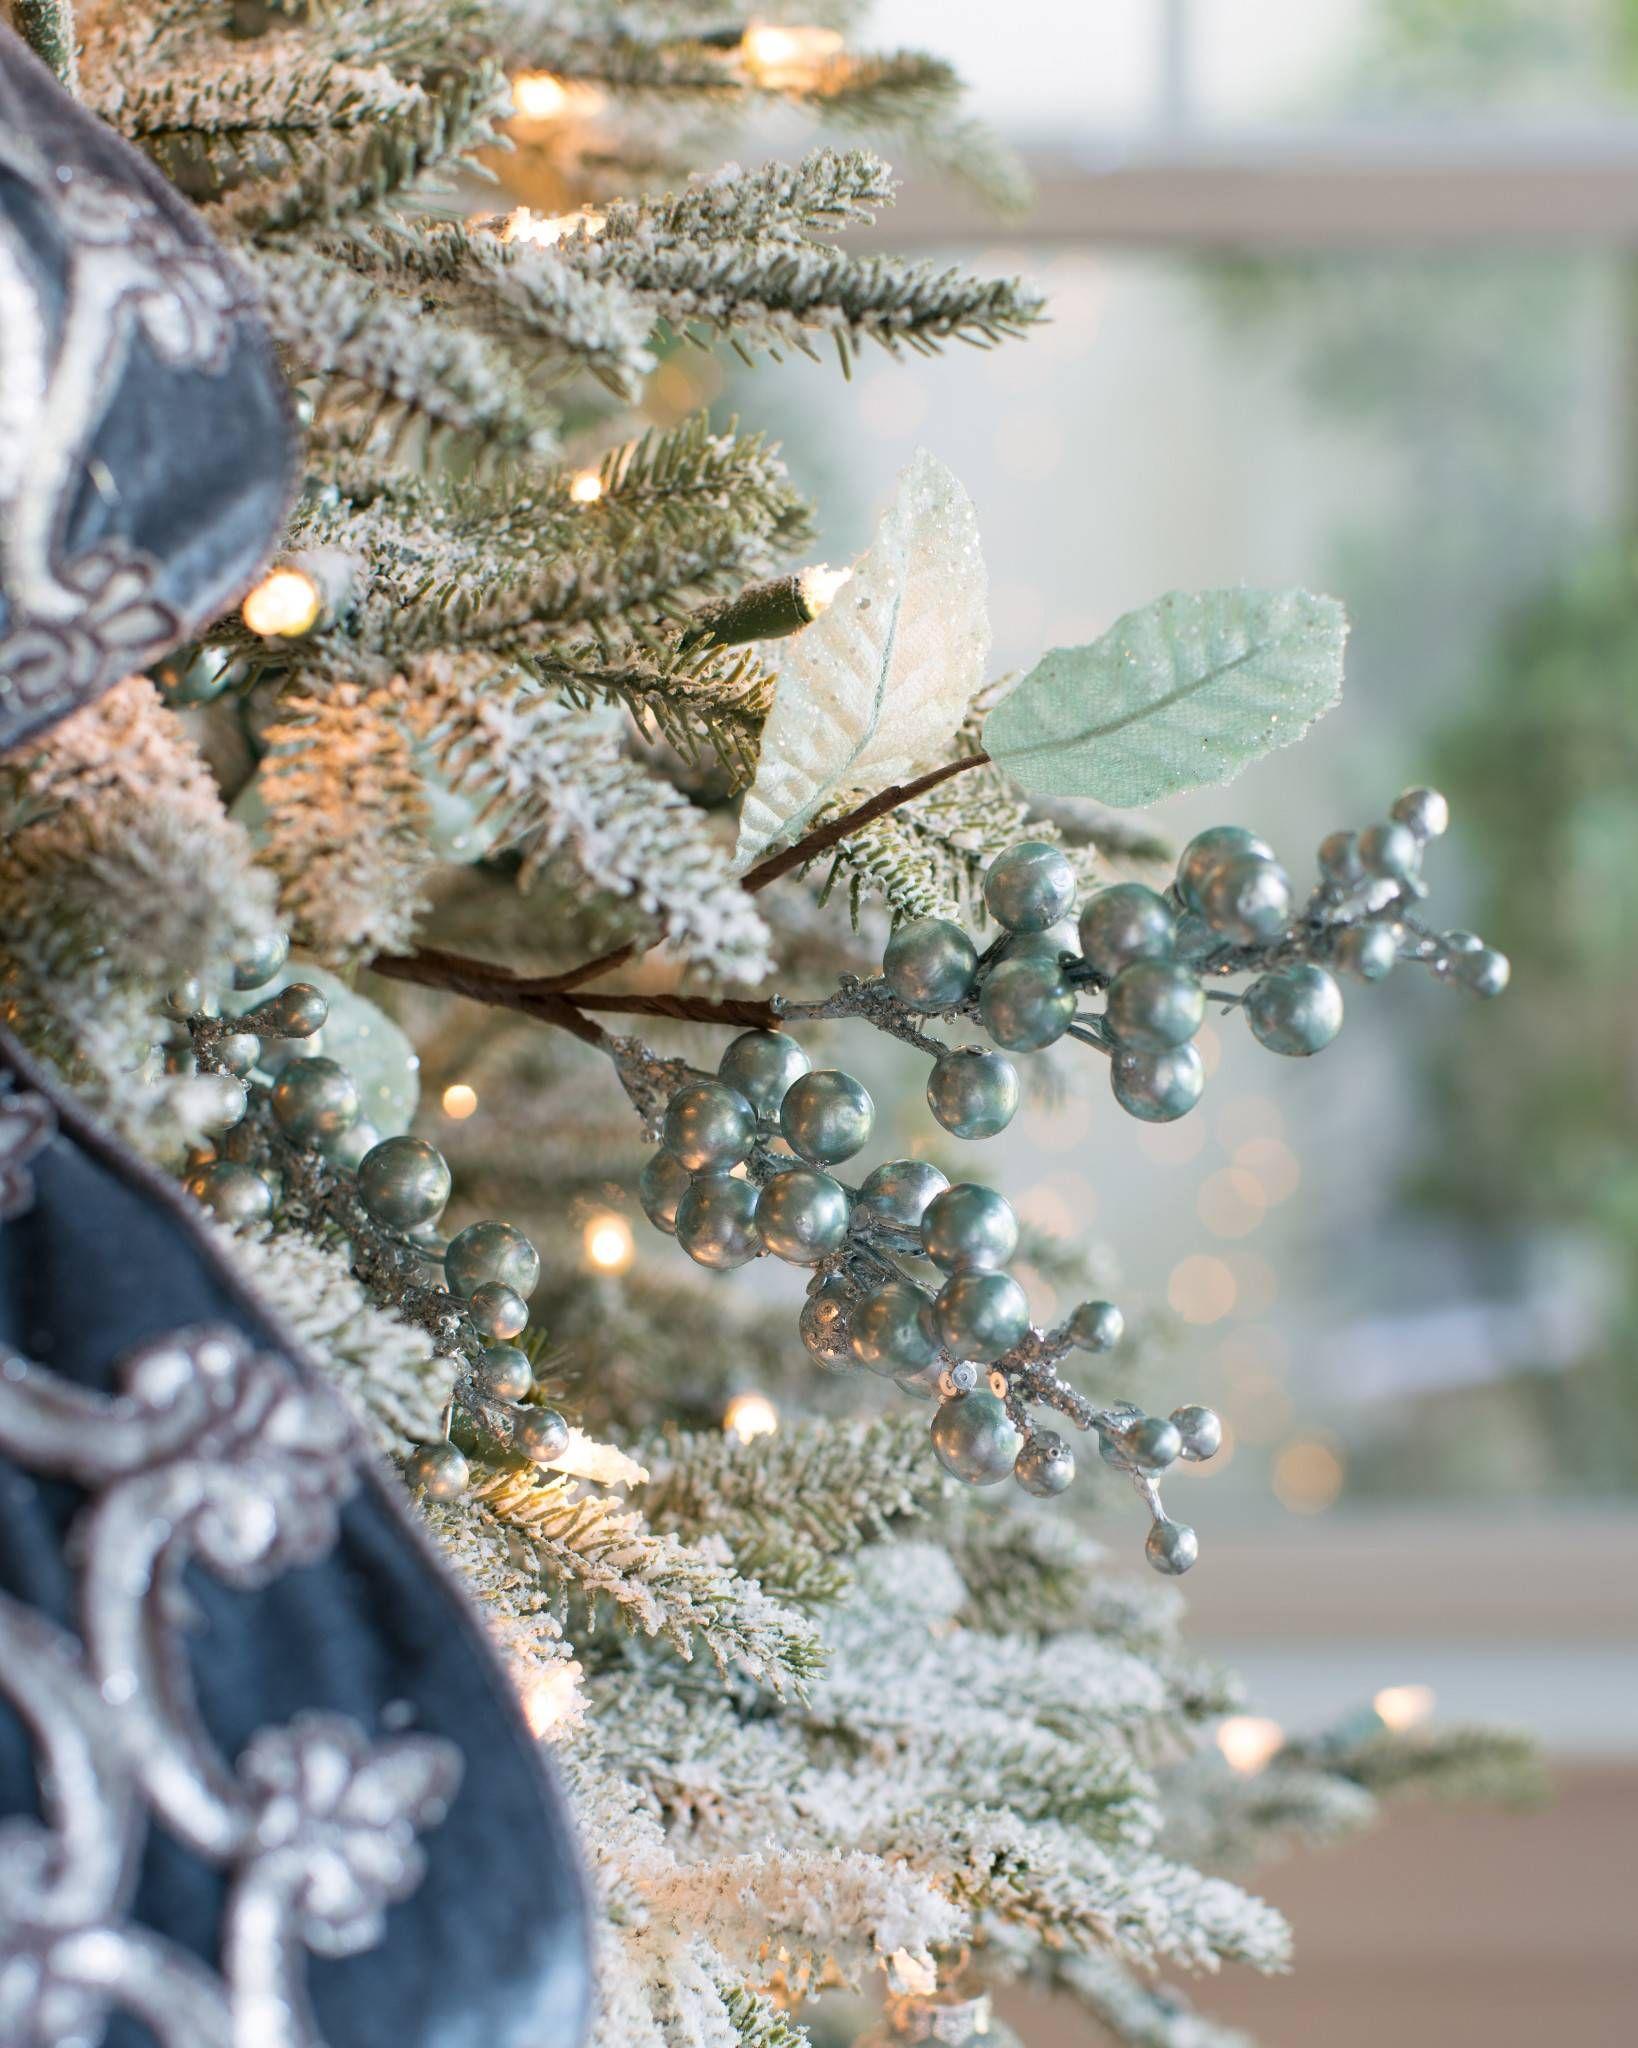 Pin On Christmas Tree Ornaments And Tree Picks